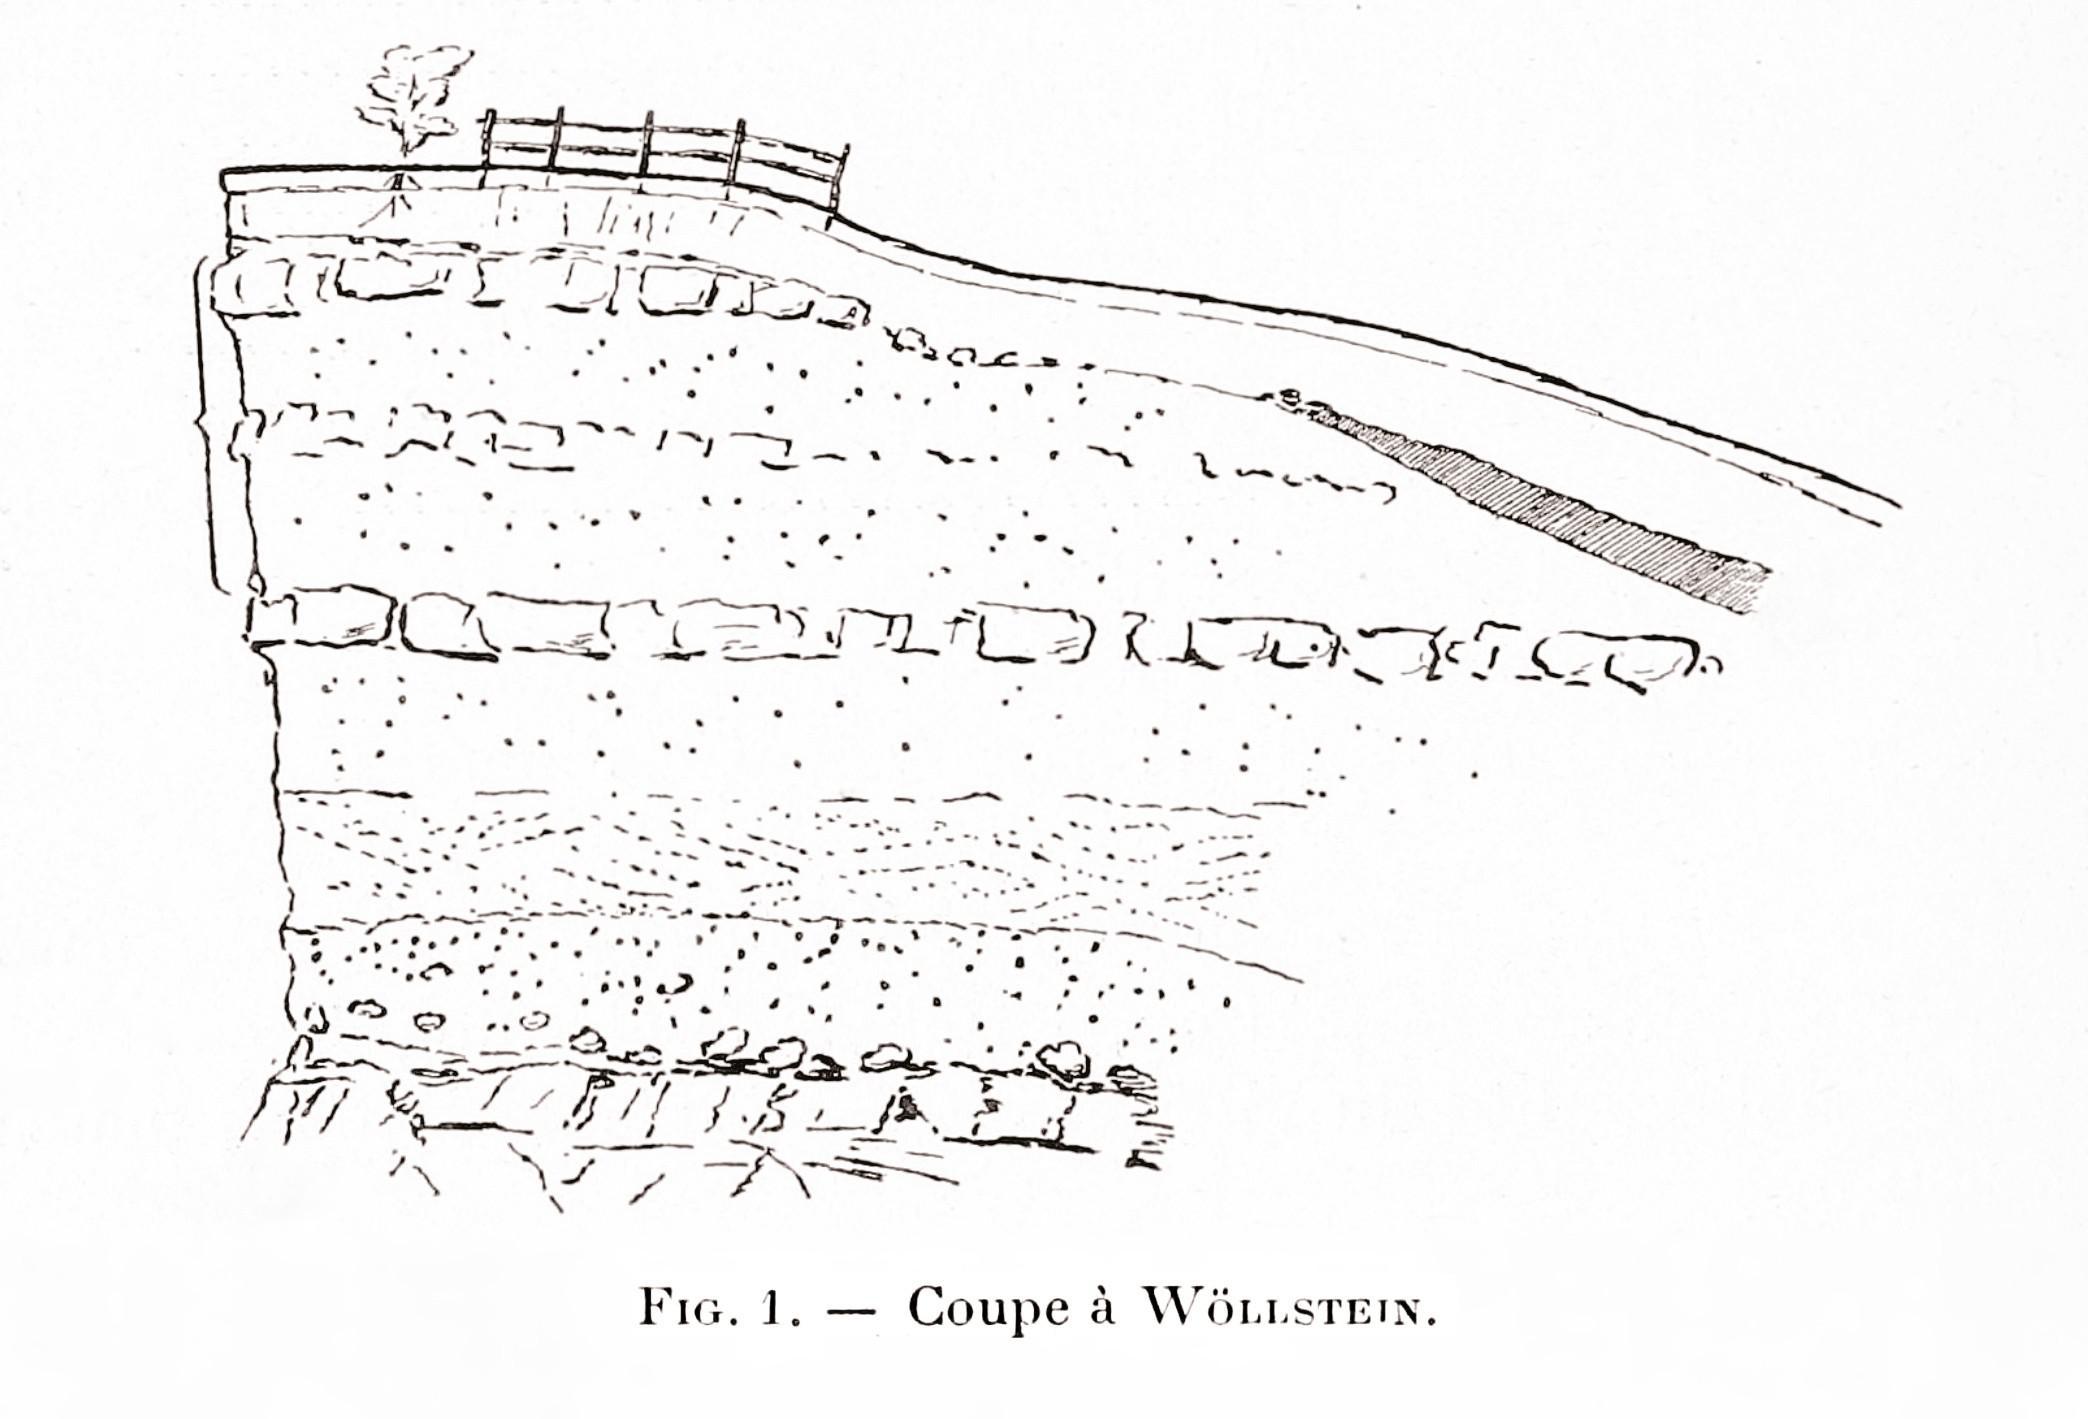 Coupe stratigraphique à Wöllstein (Allemagne)